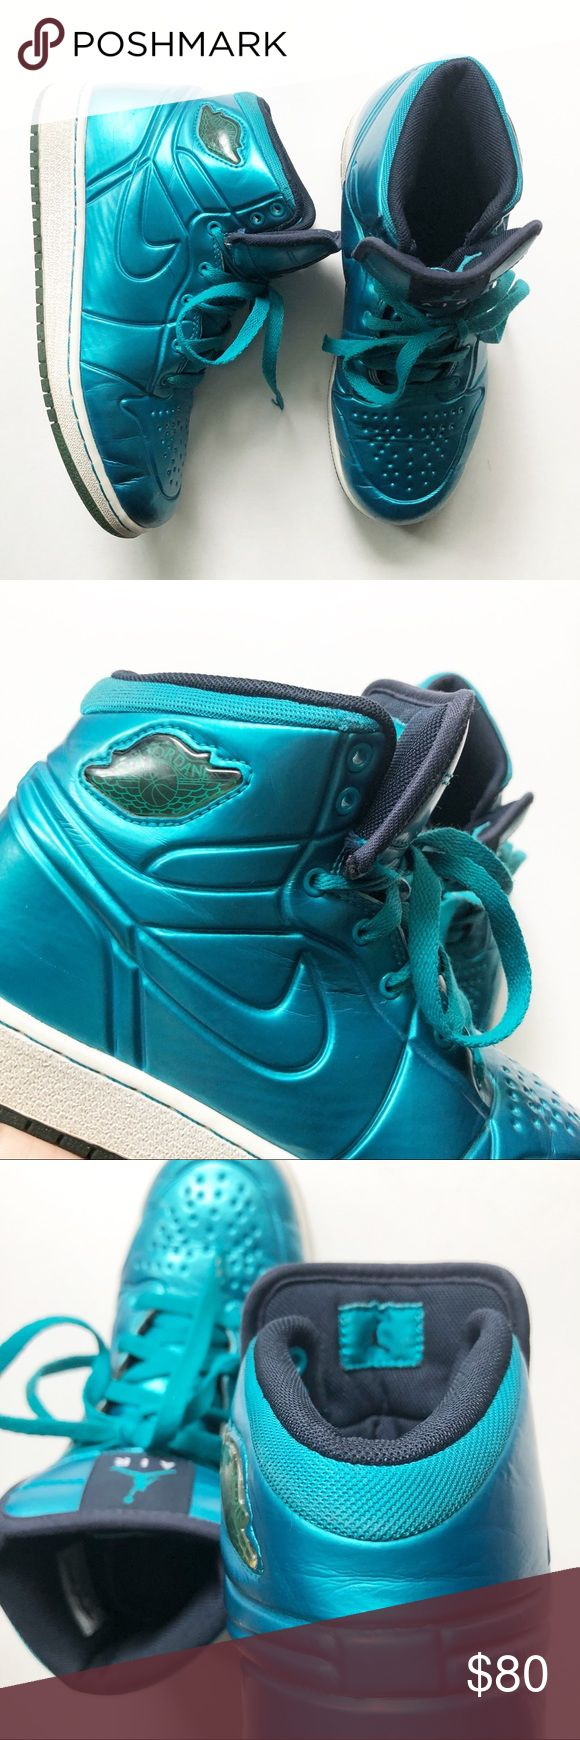 Nike Rare Air Jordan 1 Anodized Sneaker 5Y/6.5W Rare 2010